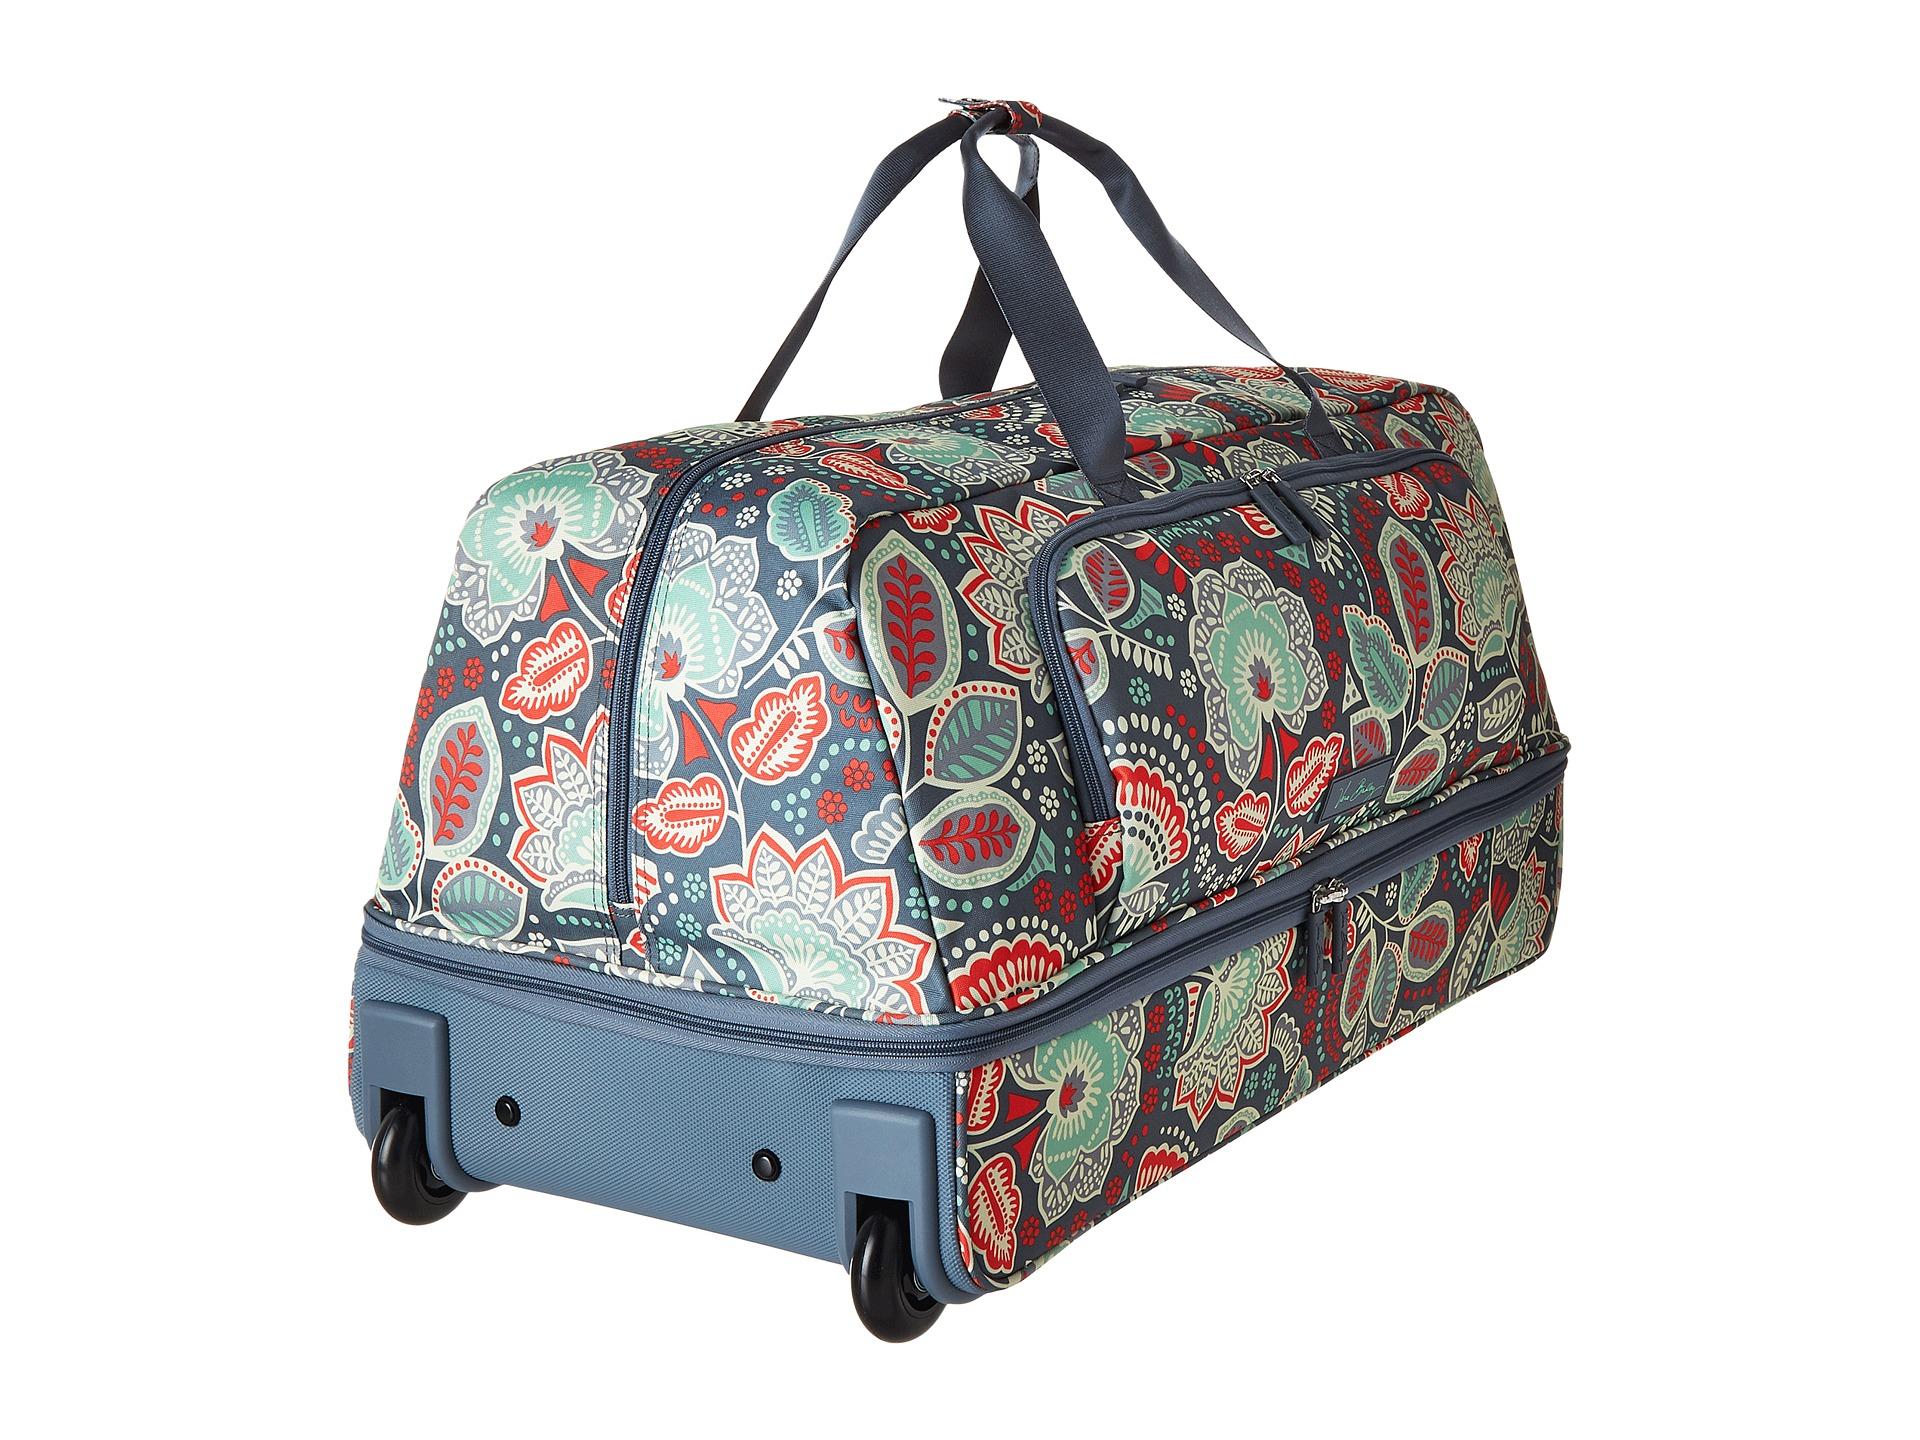 Vera Bradley Luggage Lighten Up Large Wheeled Duffel Nomadic Floral - Zappos.com Free Shipping ...